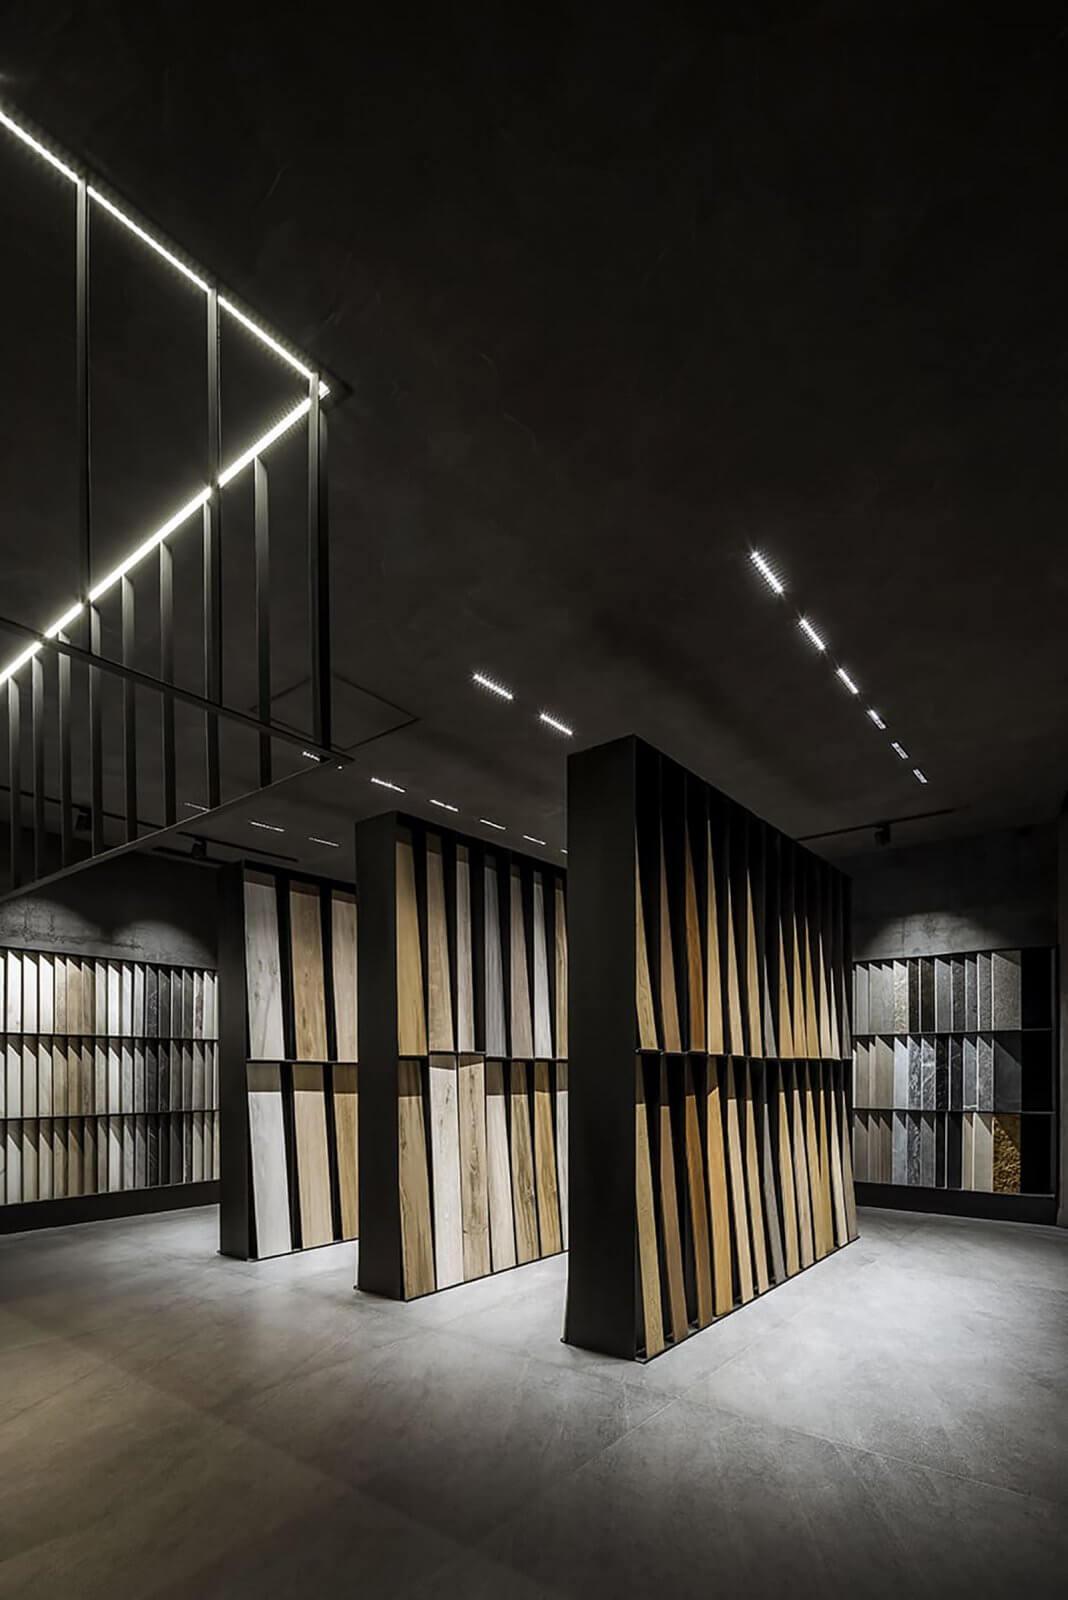 Museo ARCA  - 14.1 Cesar Bejar GrupoARCA GDL 014 69